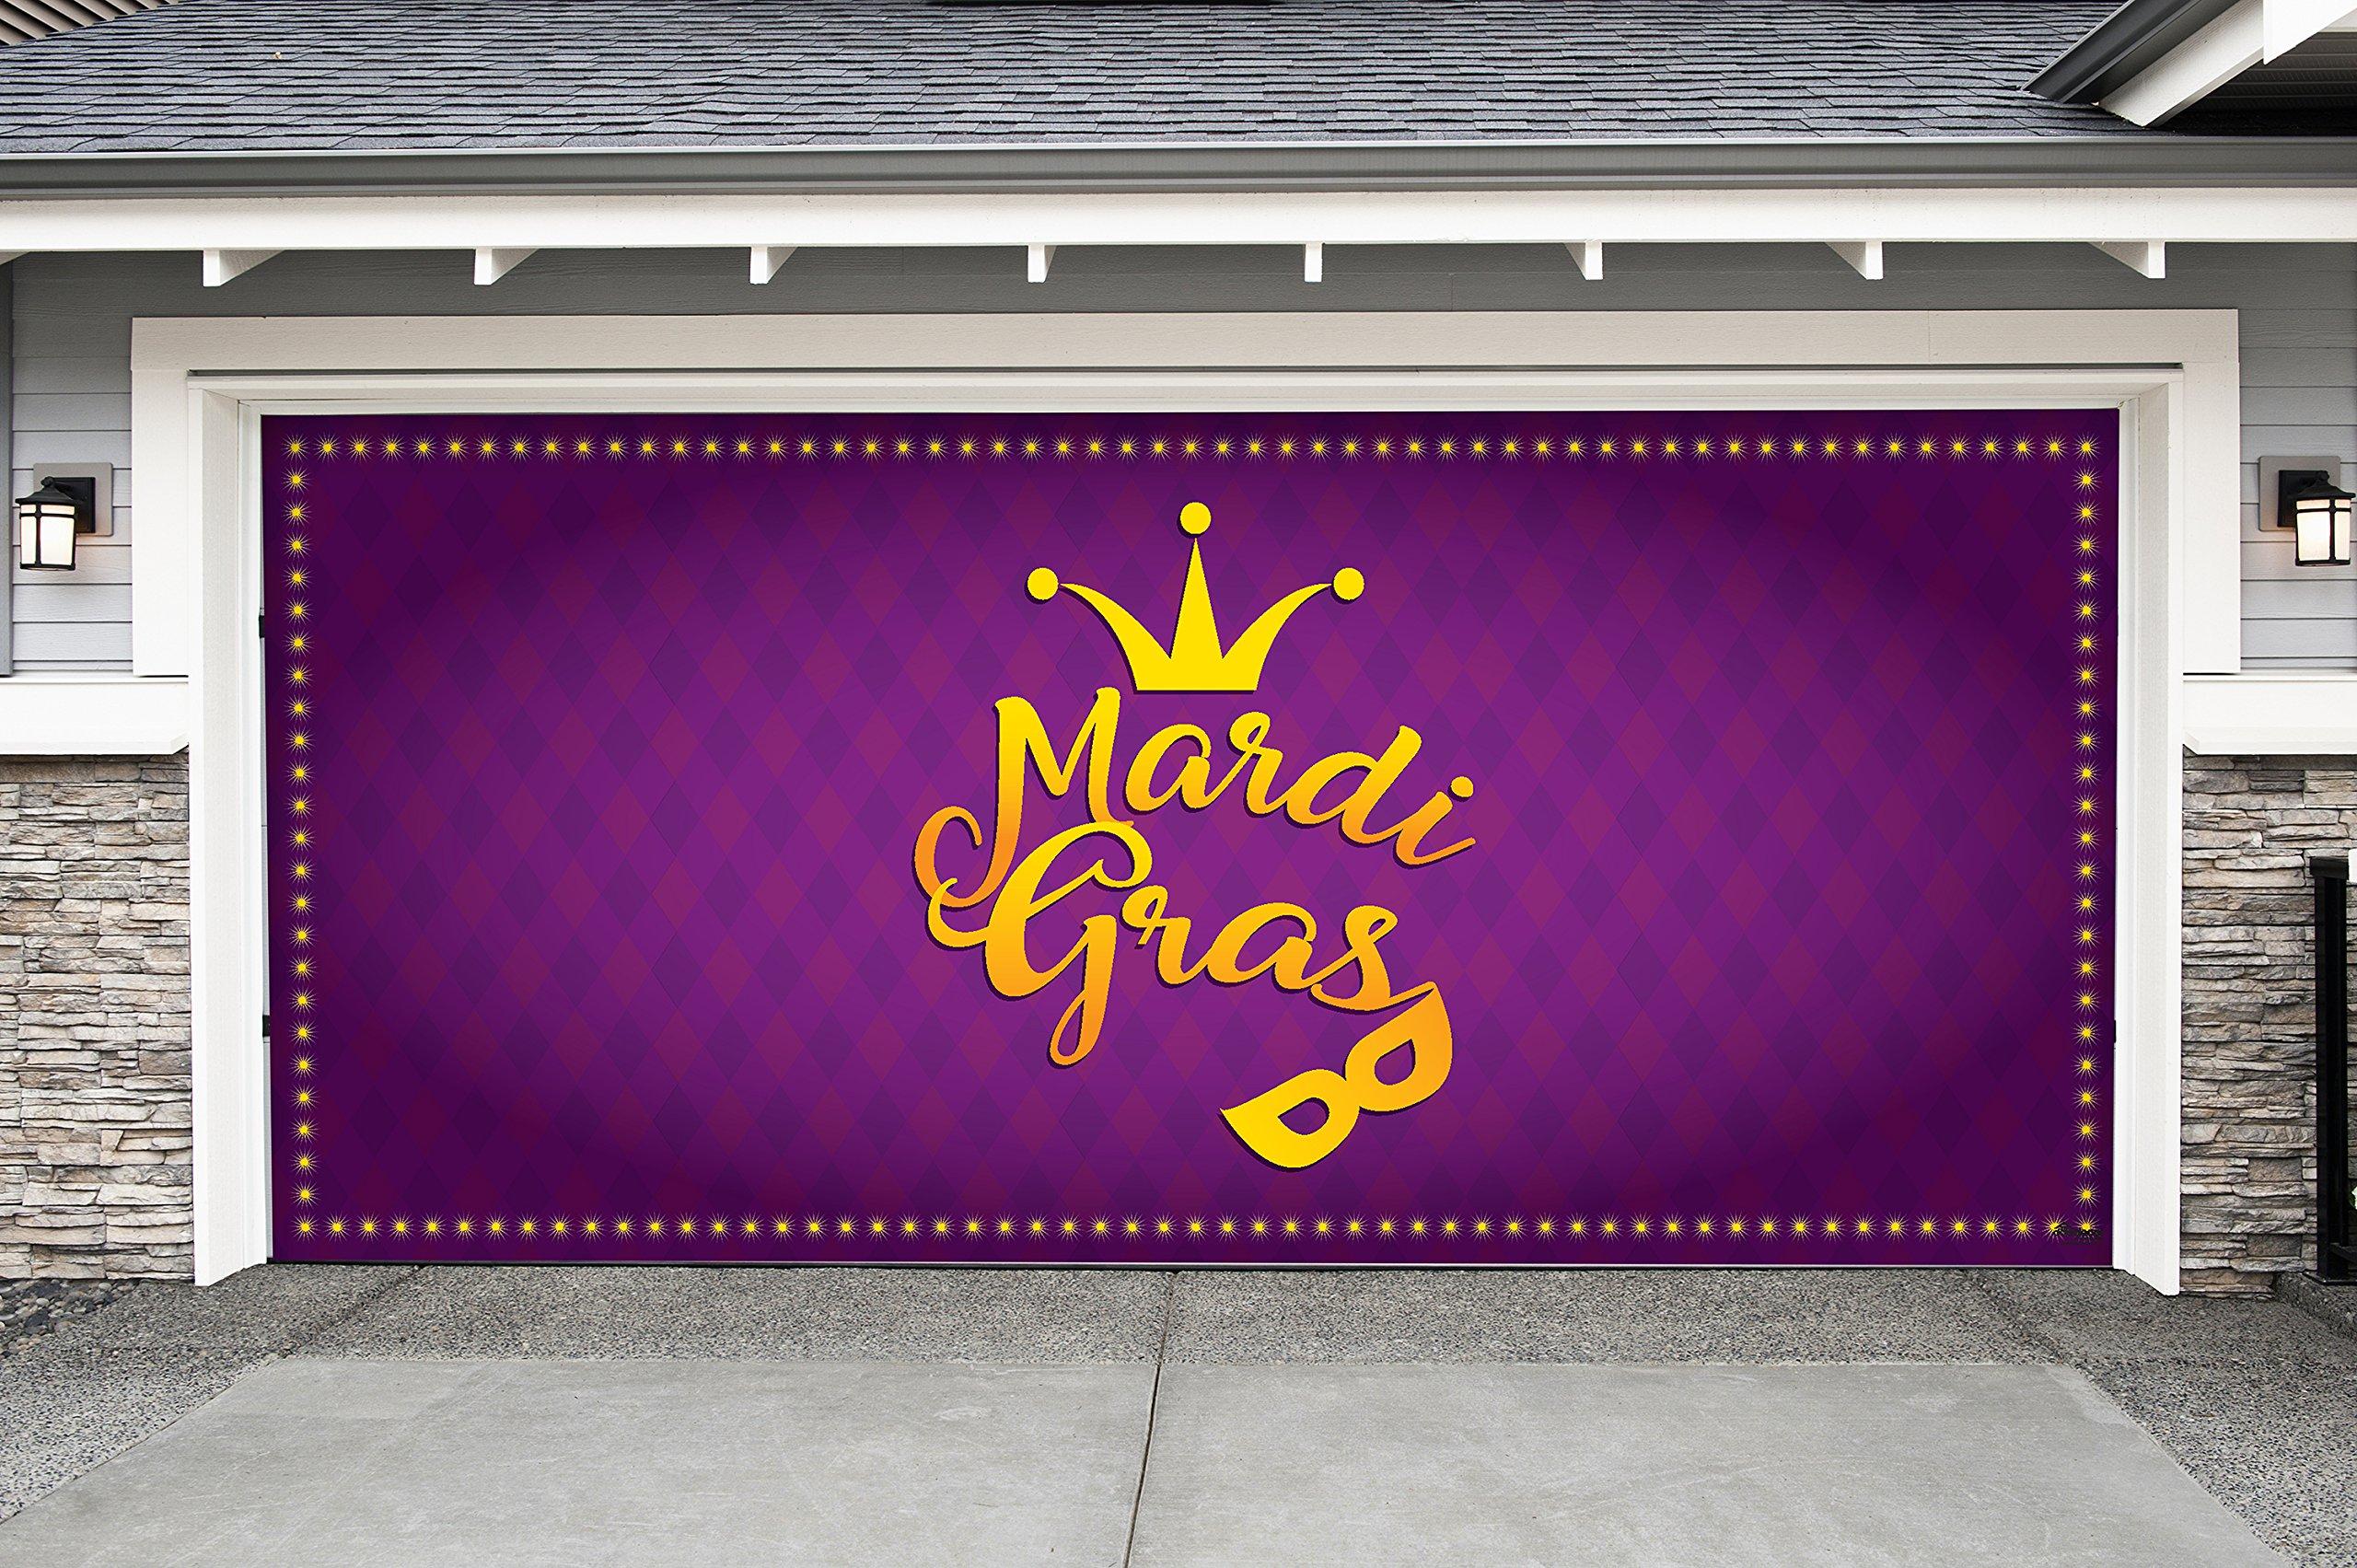 Outdoor Mardi Gras Decorations Garage Door Banner Cover Mural Décoration 7'x16' - Mardi Gras Crown and Mask - ''The Original Mardi Gras Supplies Holiday Garage Door Banner Decor''